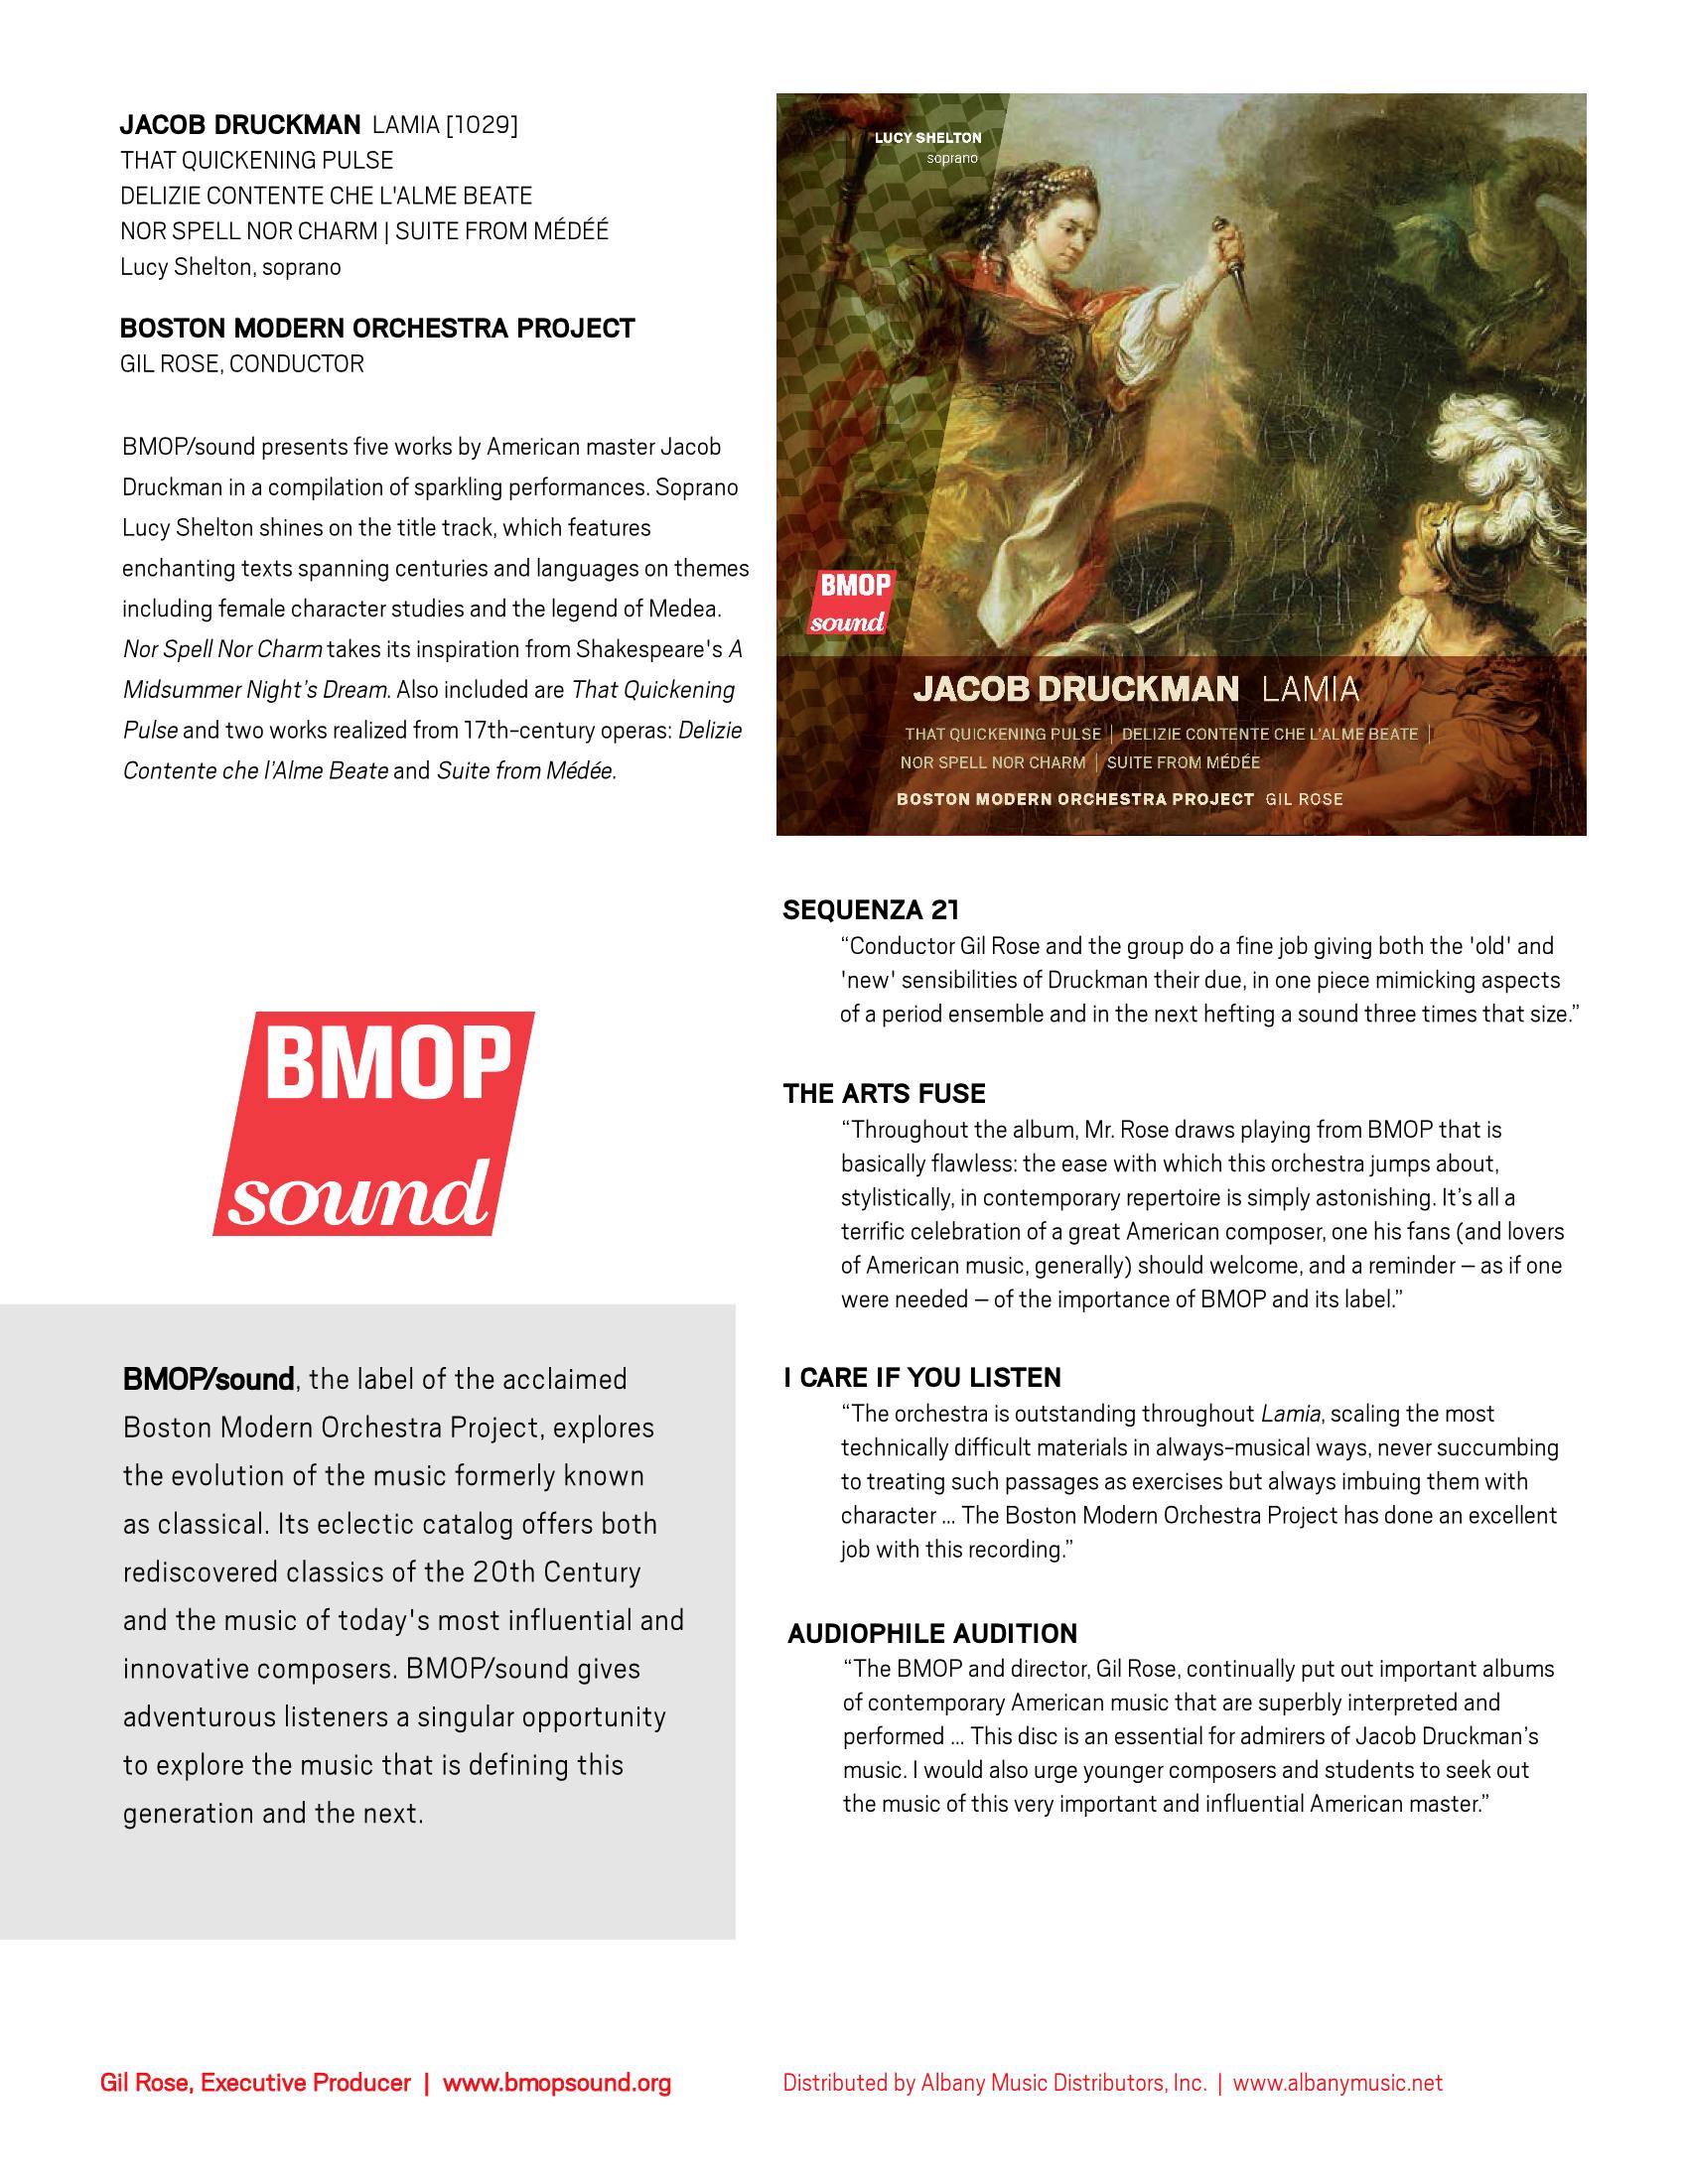 Druckman - BMOPsound 1029 one-sheet.png